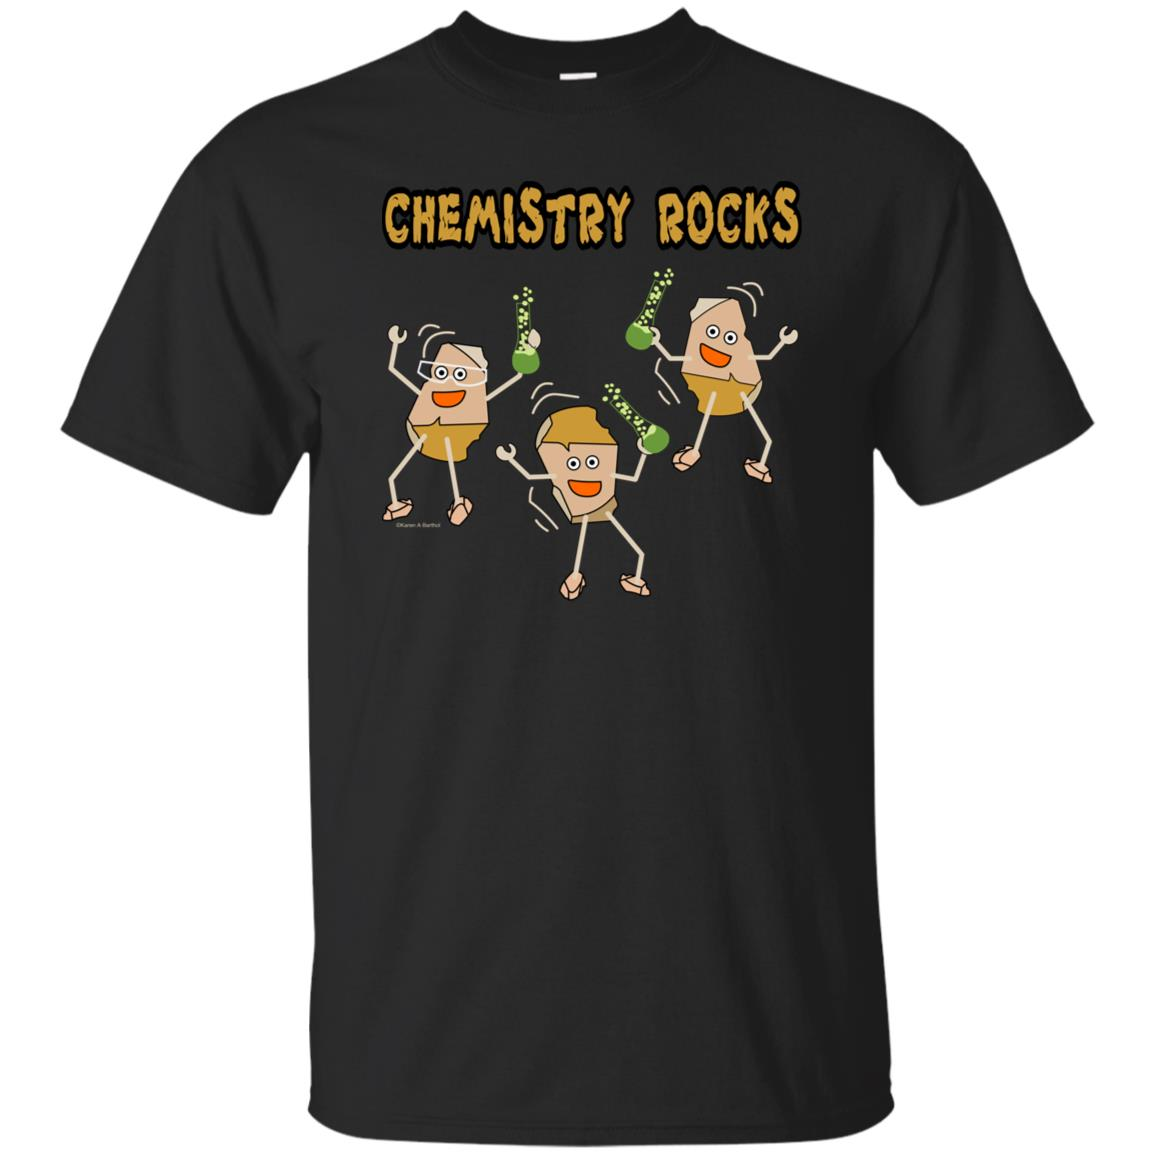 Chemistry Rocks Funny Science Unisex Short Sleeve